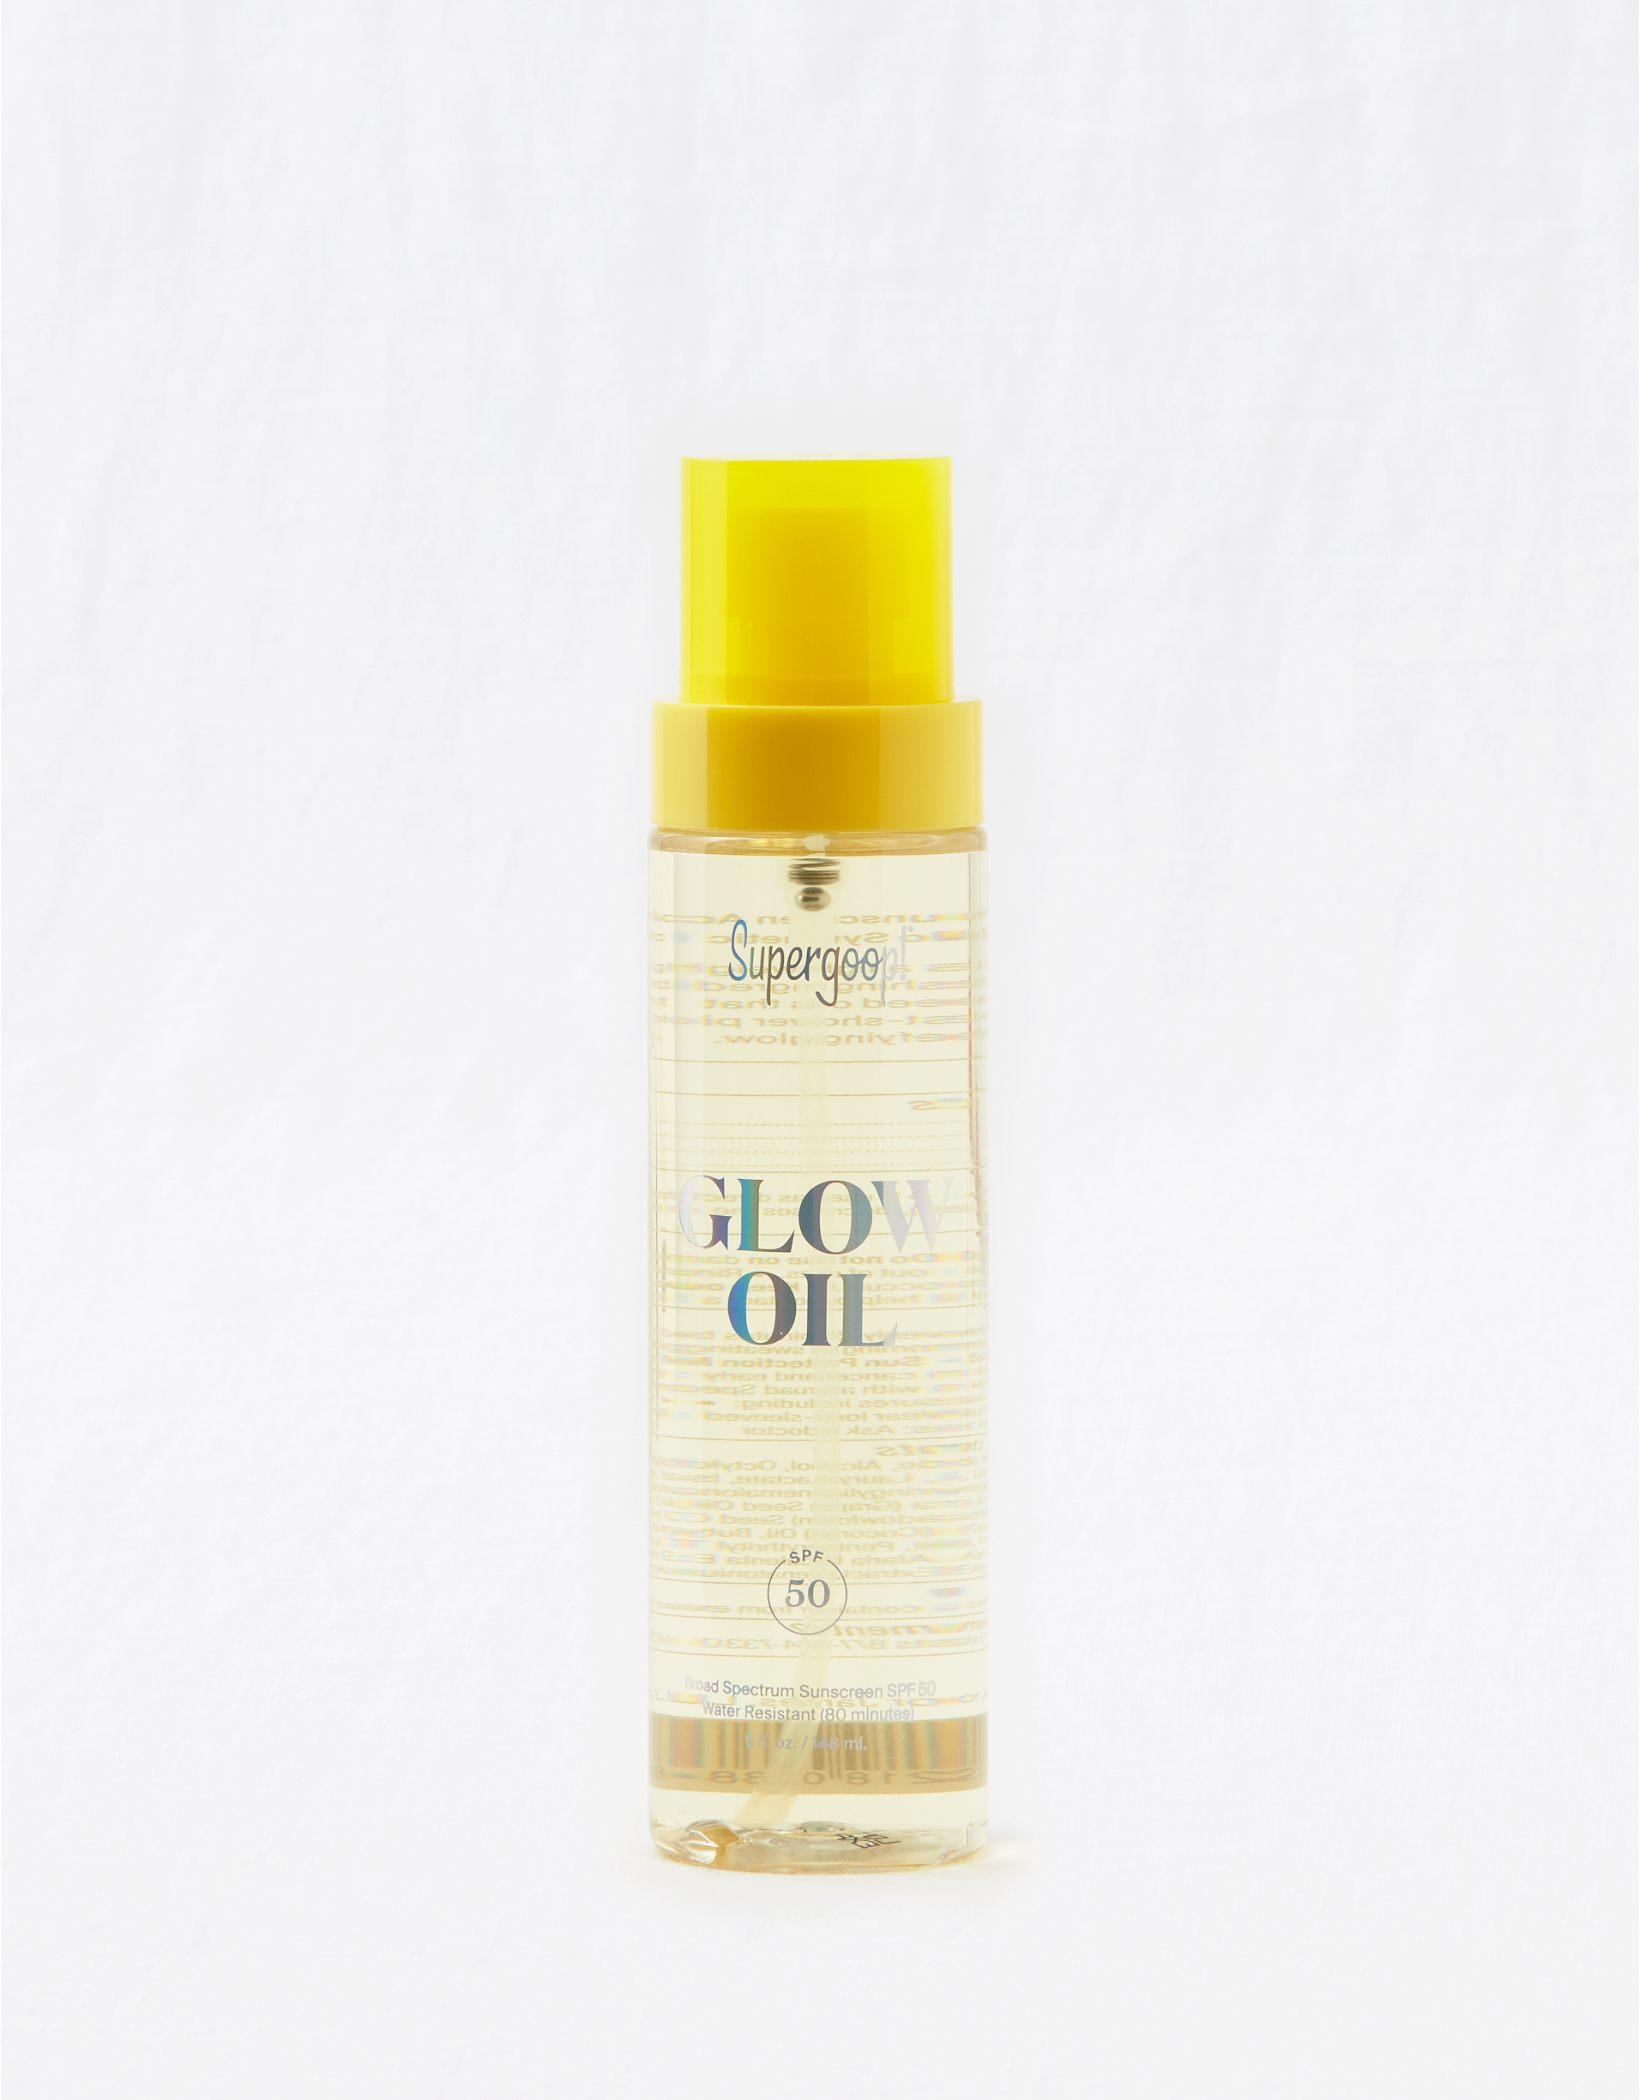 Supergoop!® Glow Oil SPF 50 5 Oz